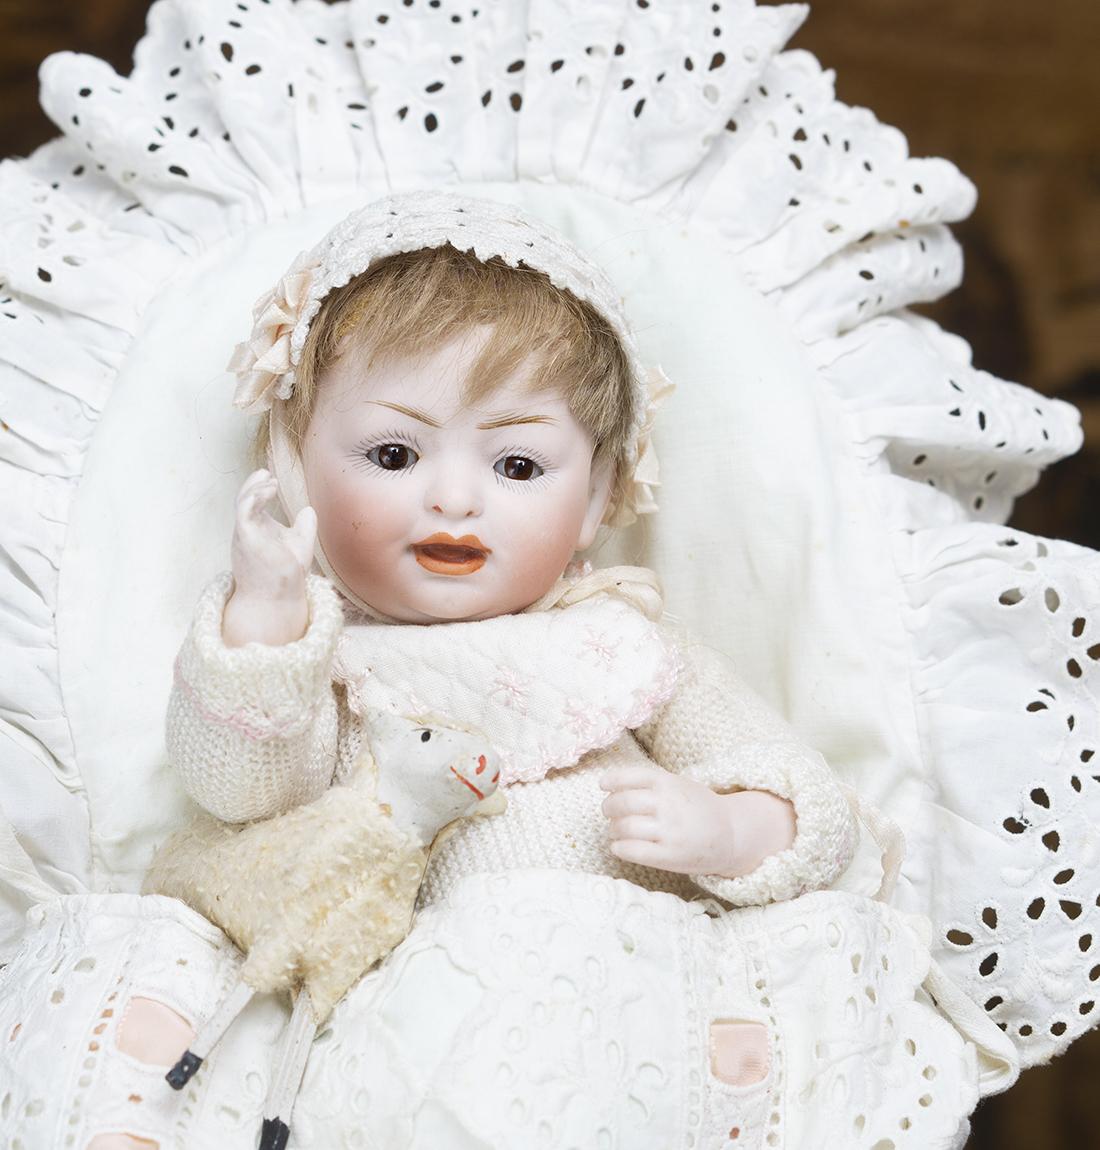 25см Характерная кукла-малыш